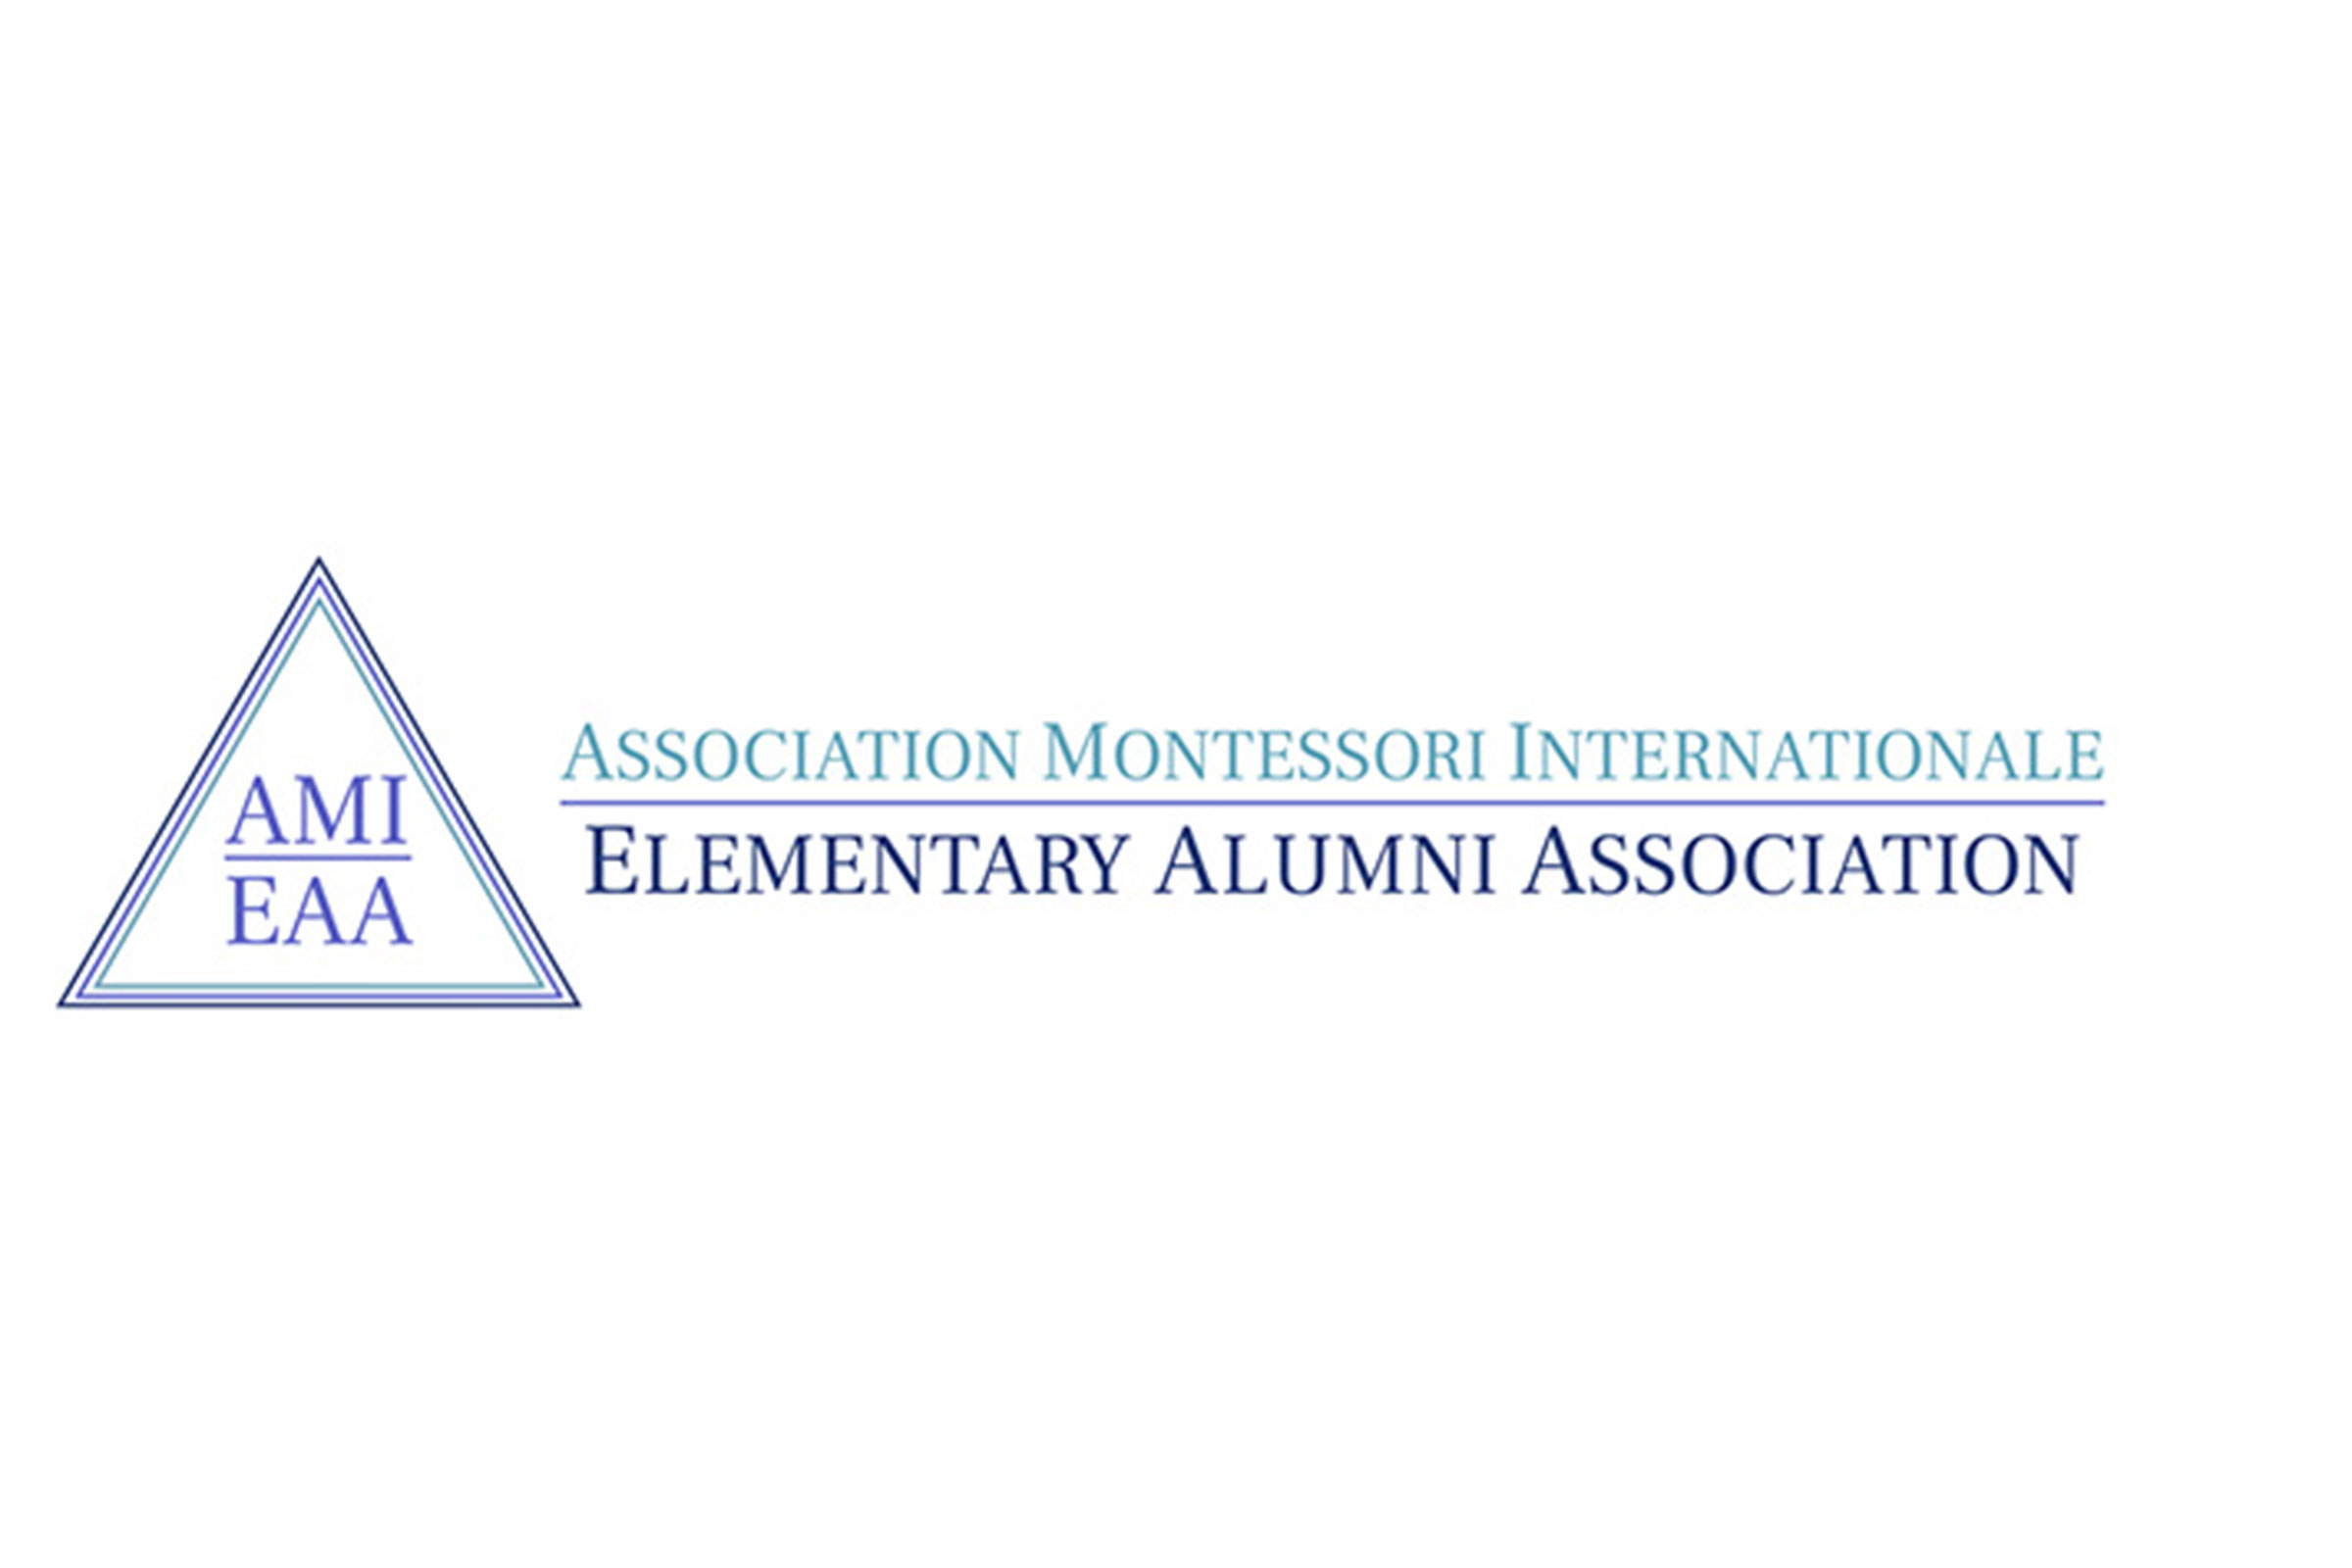 AMI Elementary Alumni Association (EAA) logo